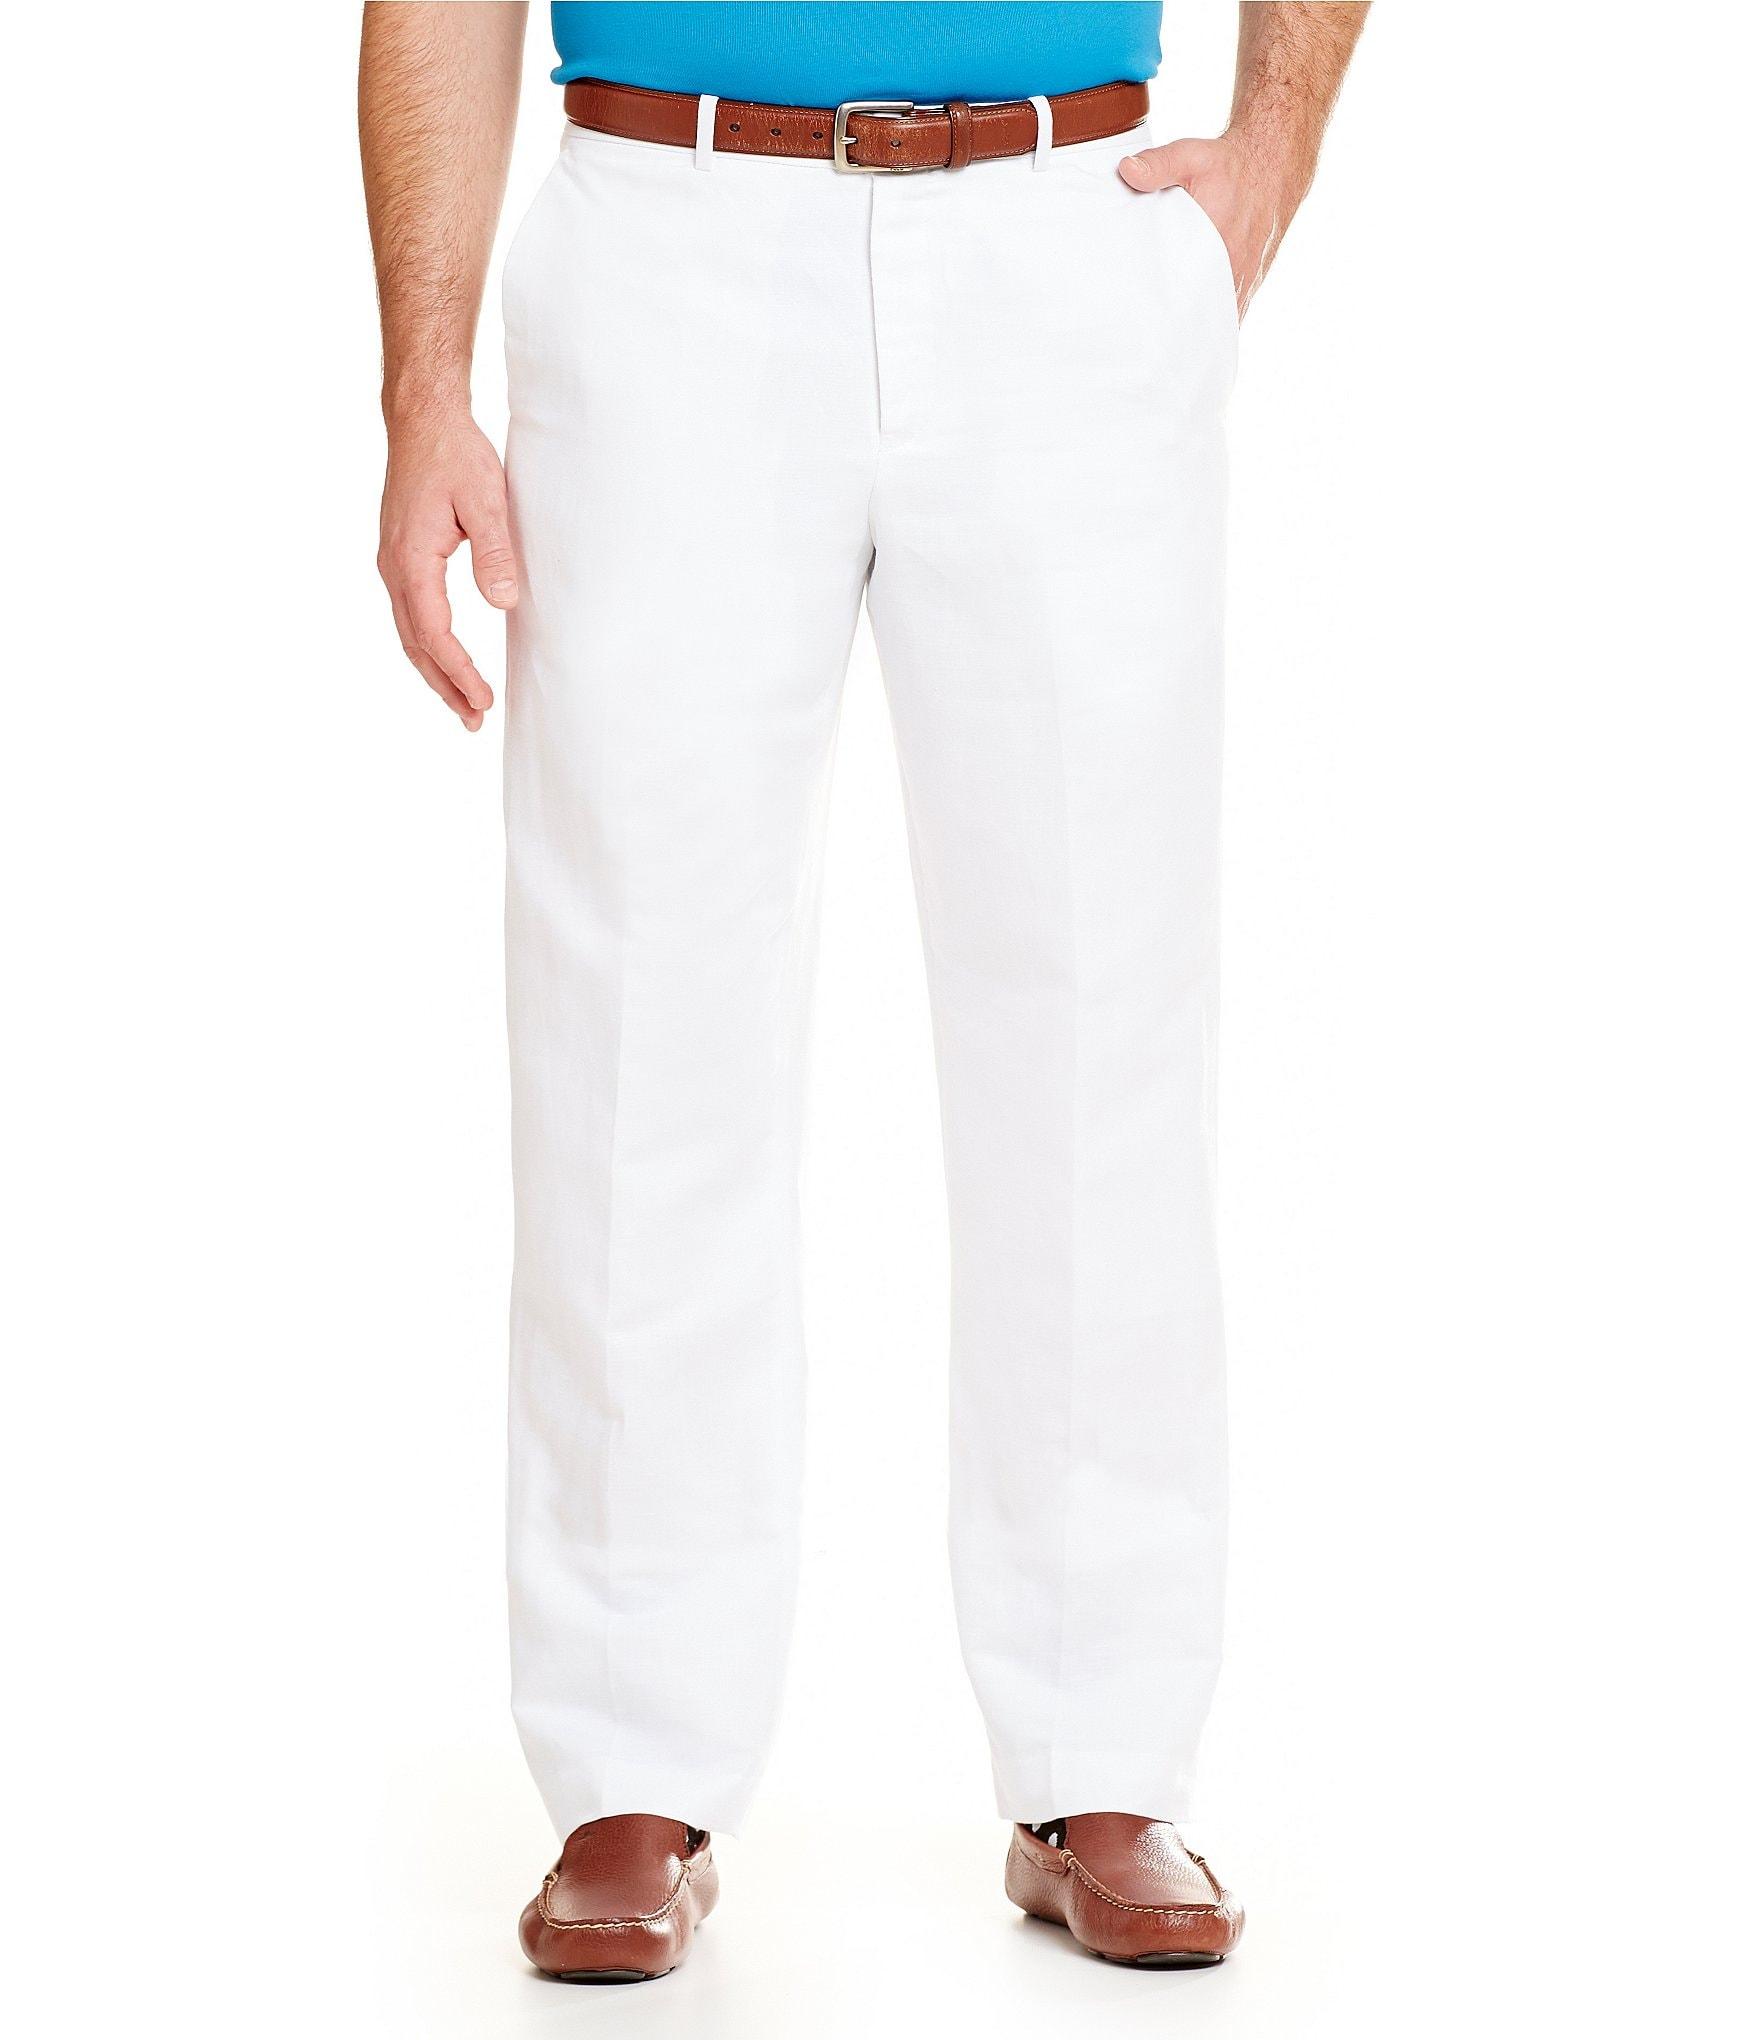 Linen Mens Clothing Mens Big And Tall Clothing Dillards